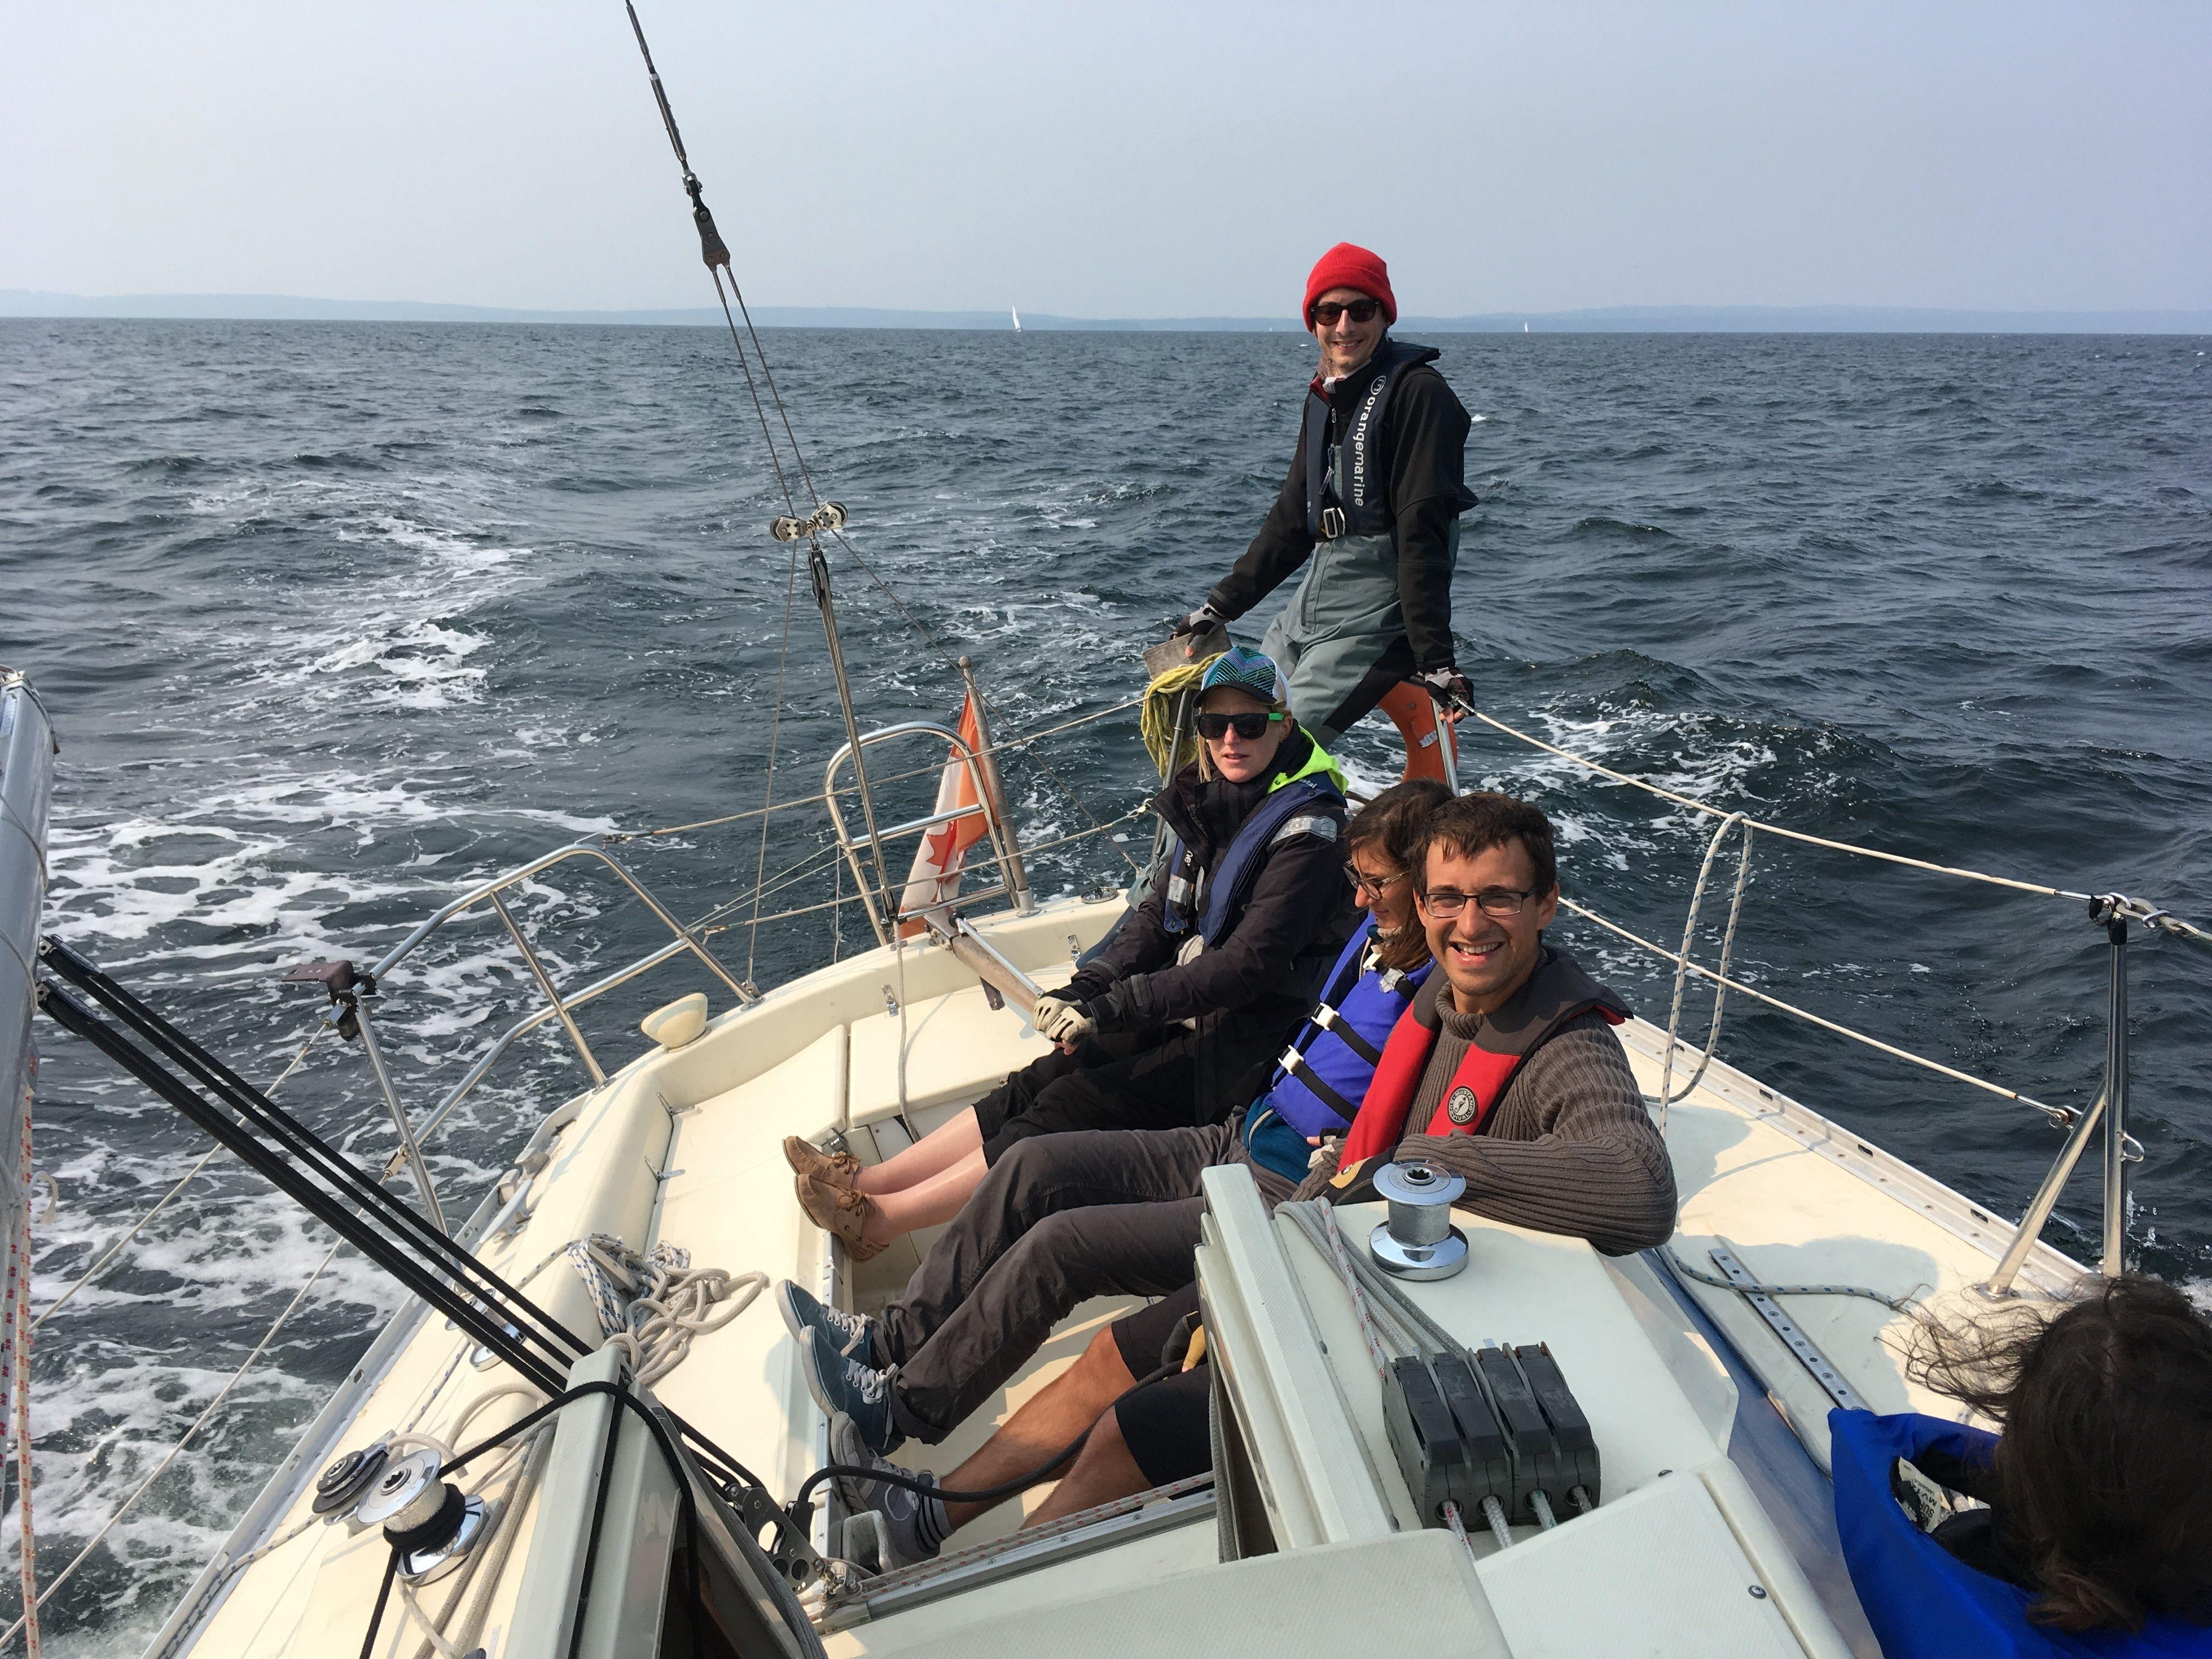 The JIB SET Sailing Club Meetup Group